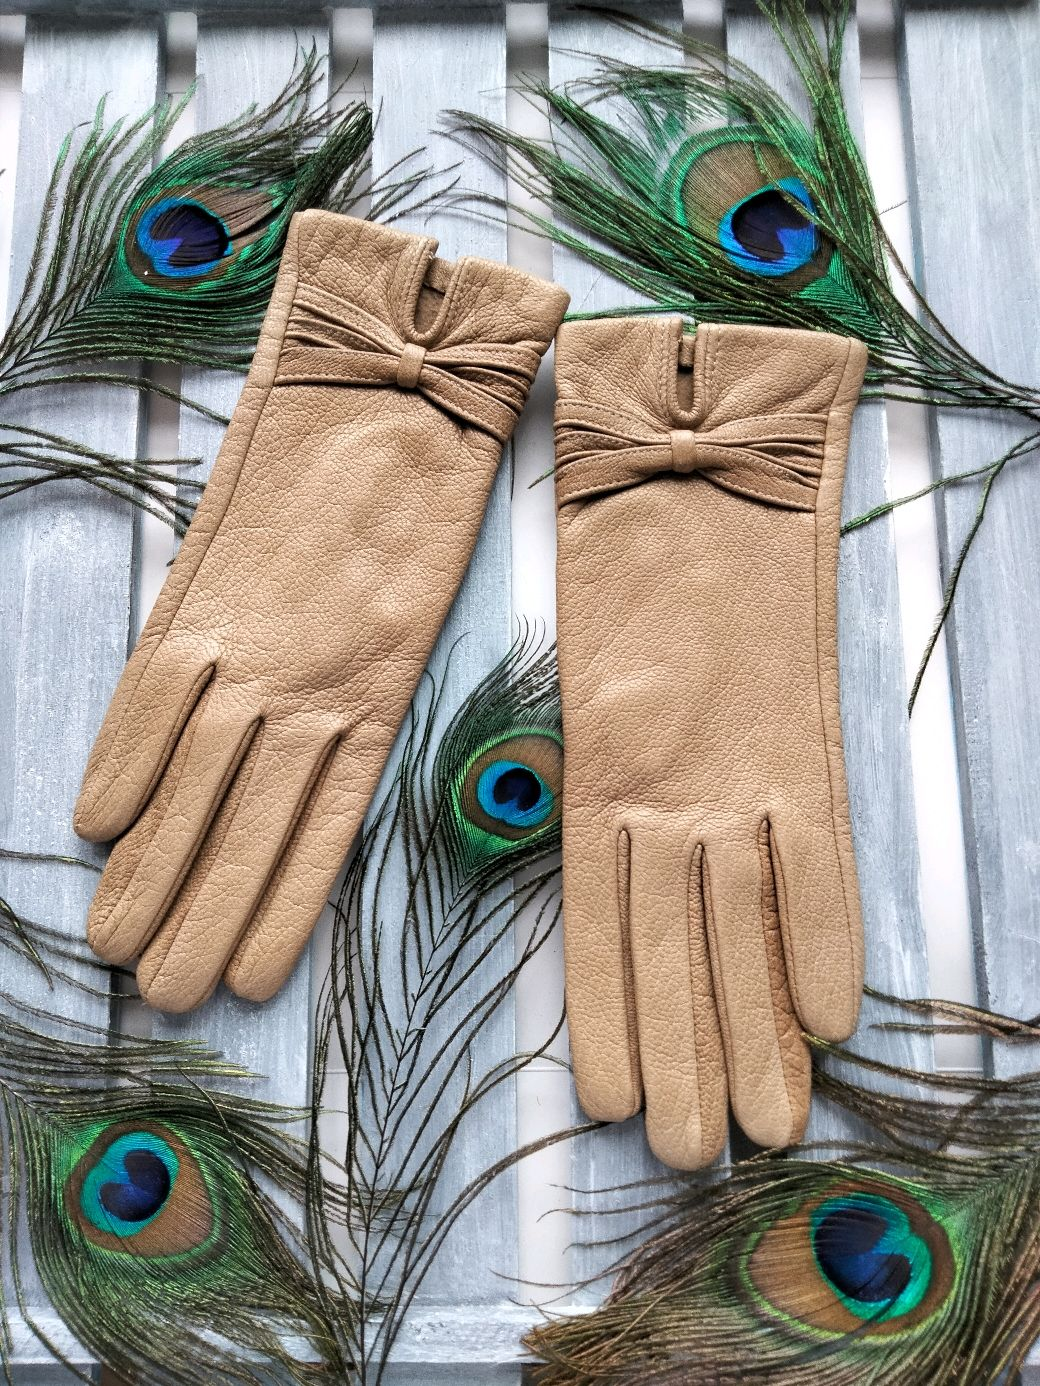 Перчатки из нат. кожи песочного цвета без подкладки размер 6-6.5, Перчатки, Москва,  Фото №1